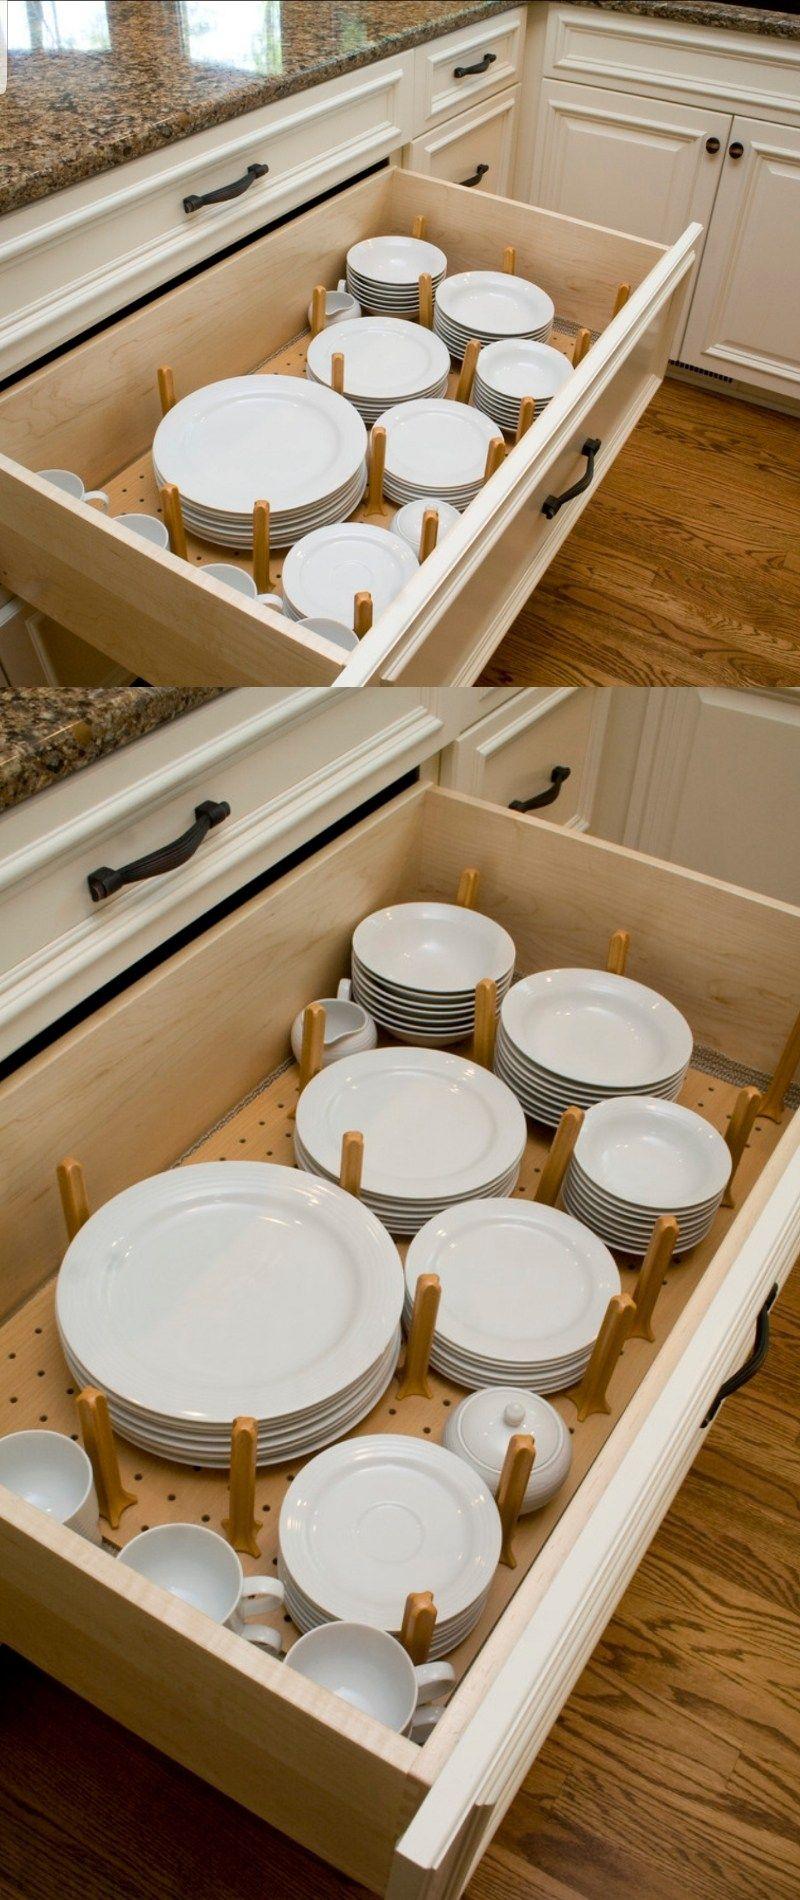 14 Kitchen Cabinet Accessories Ideas Tips On Selecting Kitchen Accessories In 2020 Kitchen Cabinet Accessories Cabinet Accessories Refacing Kitchen Cabinets